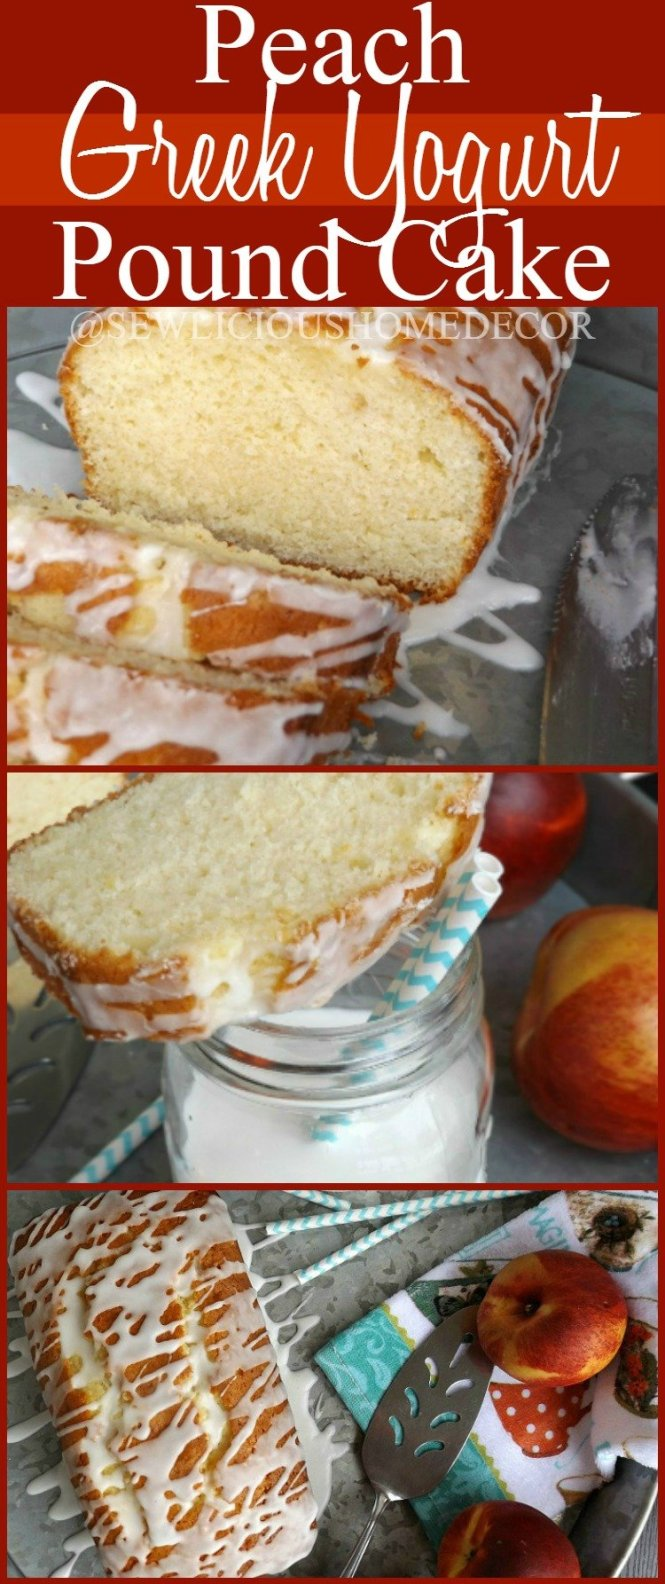 Peach Greek Yogurt Pound Cake Dessert at sewlicioushomedecor.com